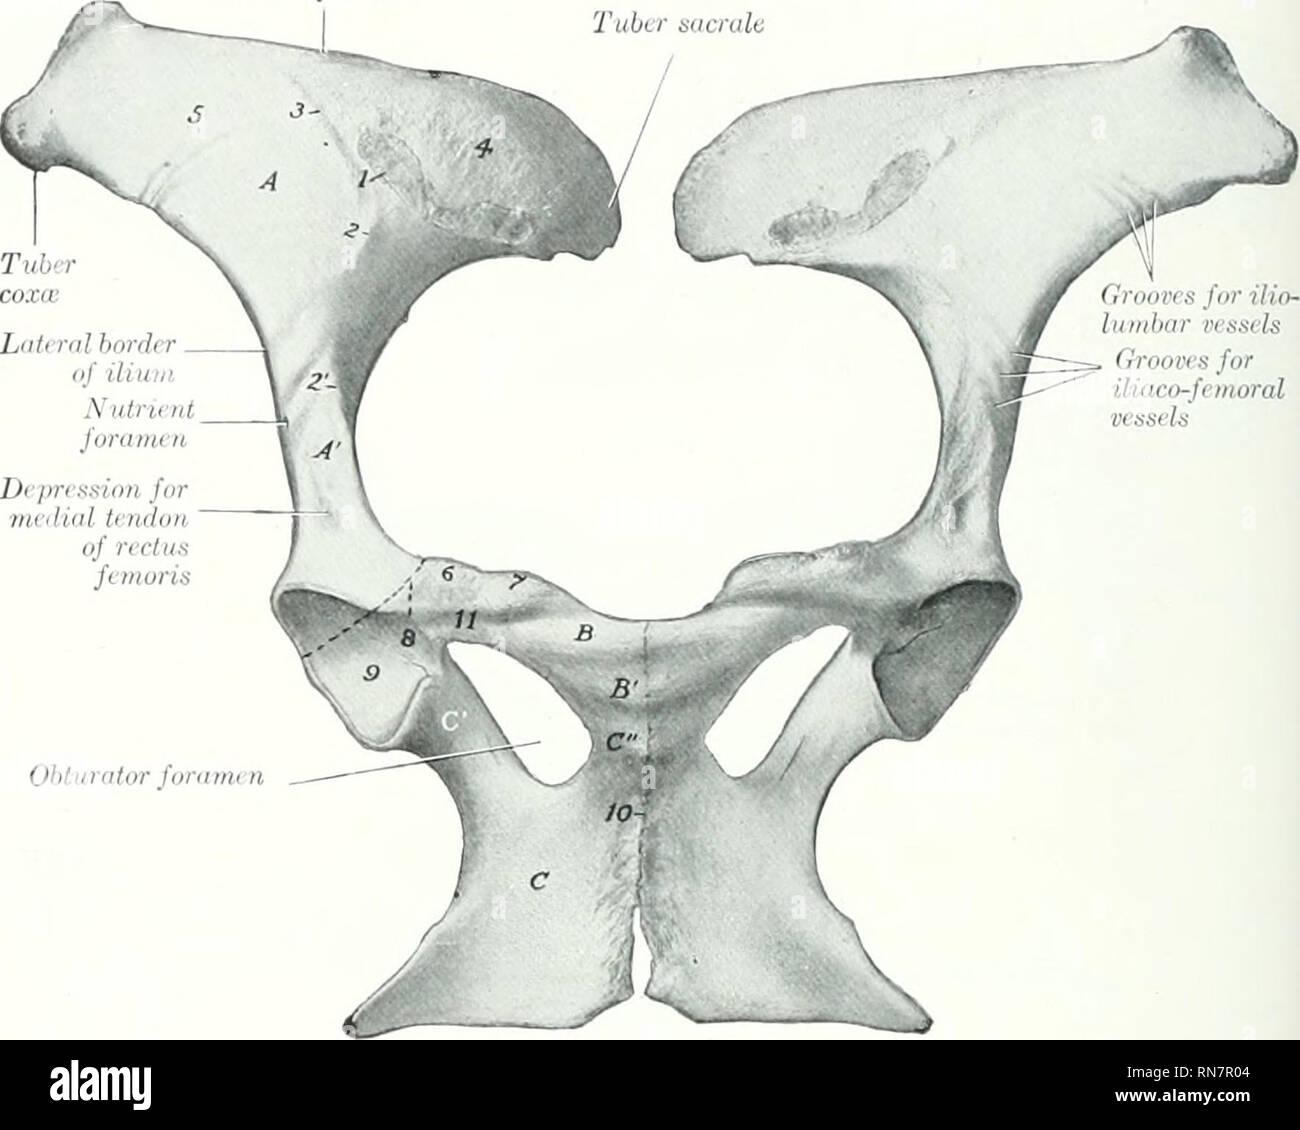 The Anatomy Of The Domestic Animals Veterinary Anatomy Los The